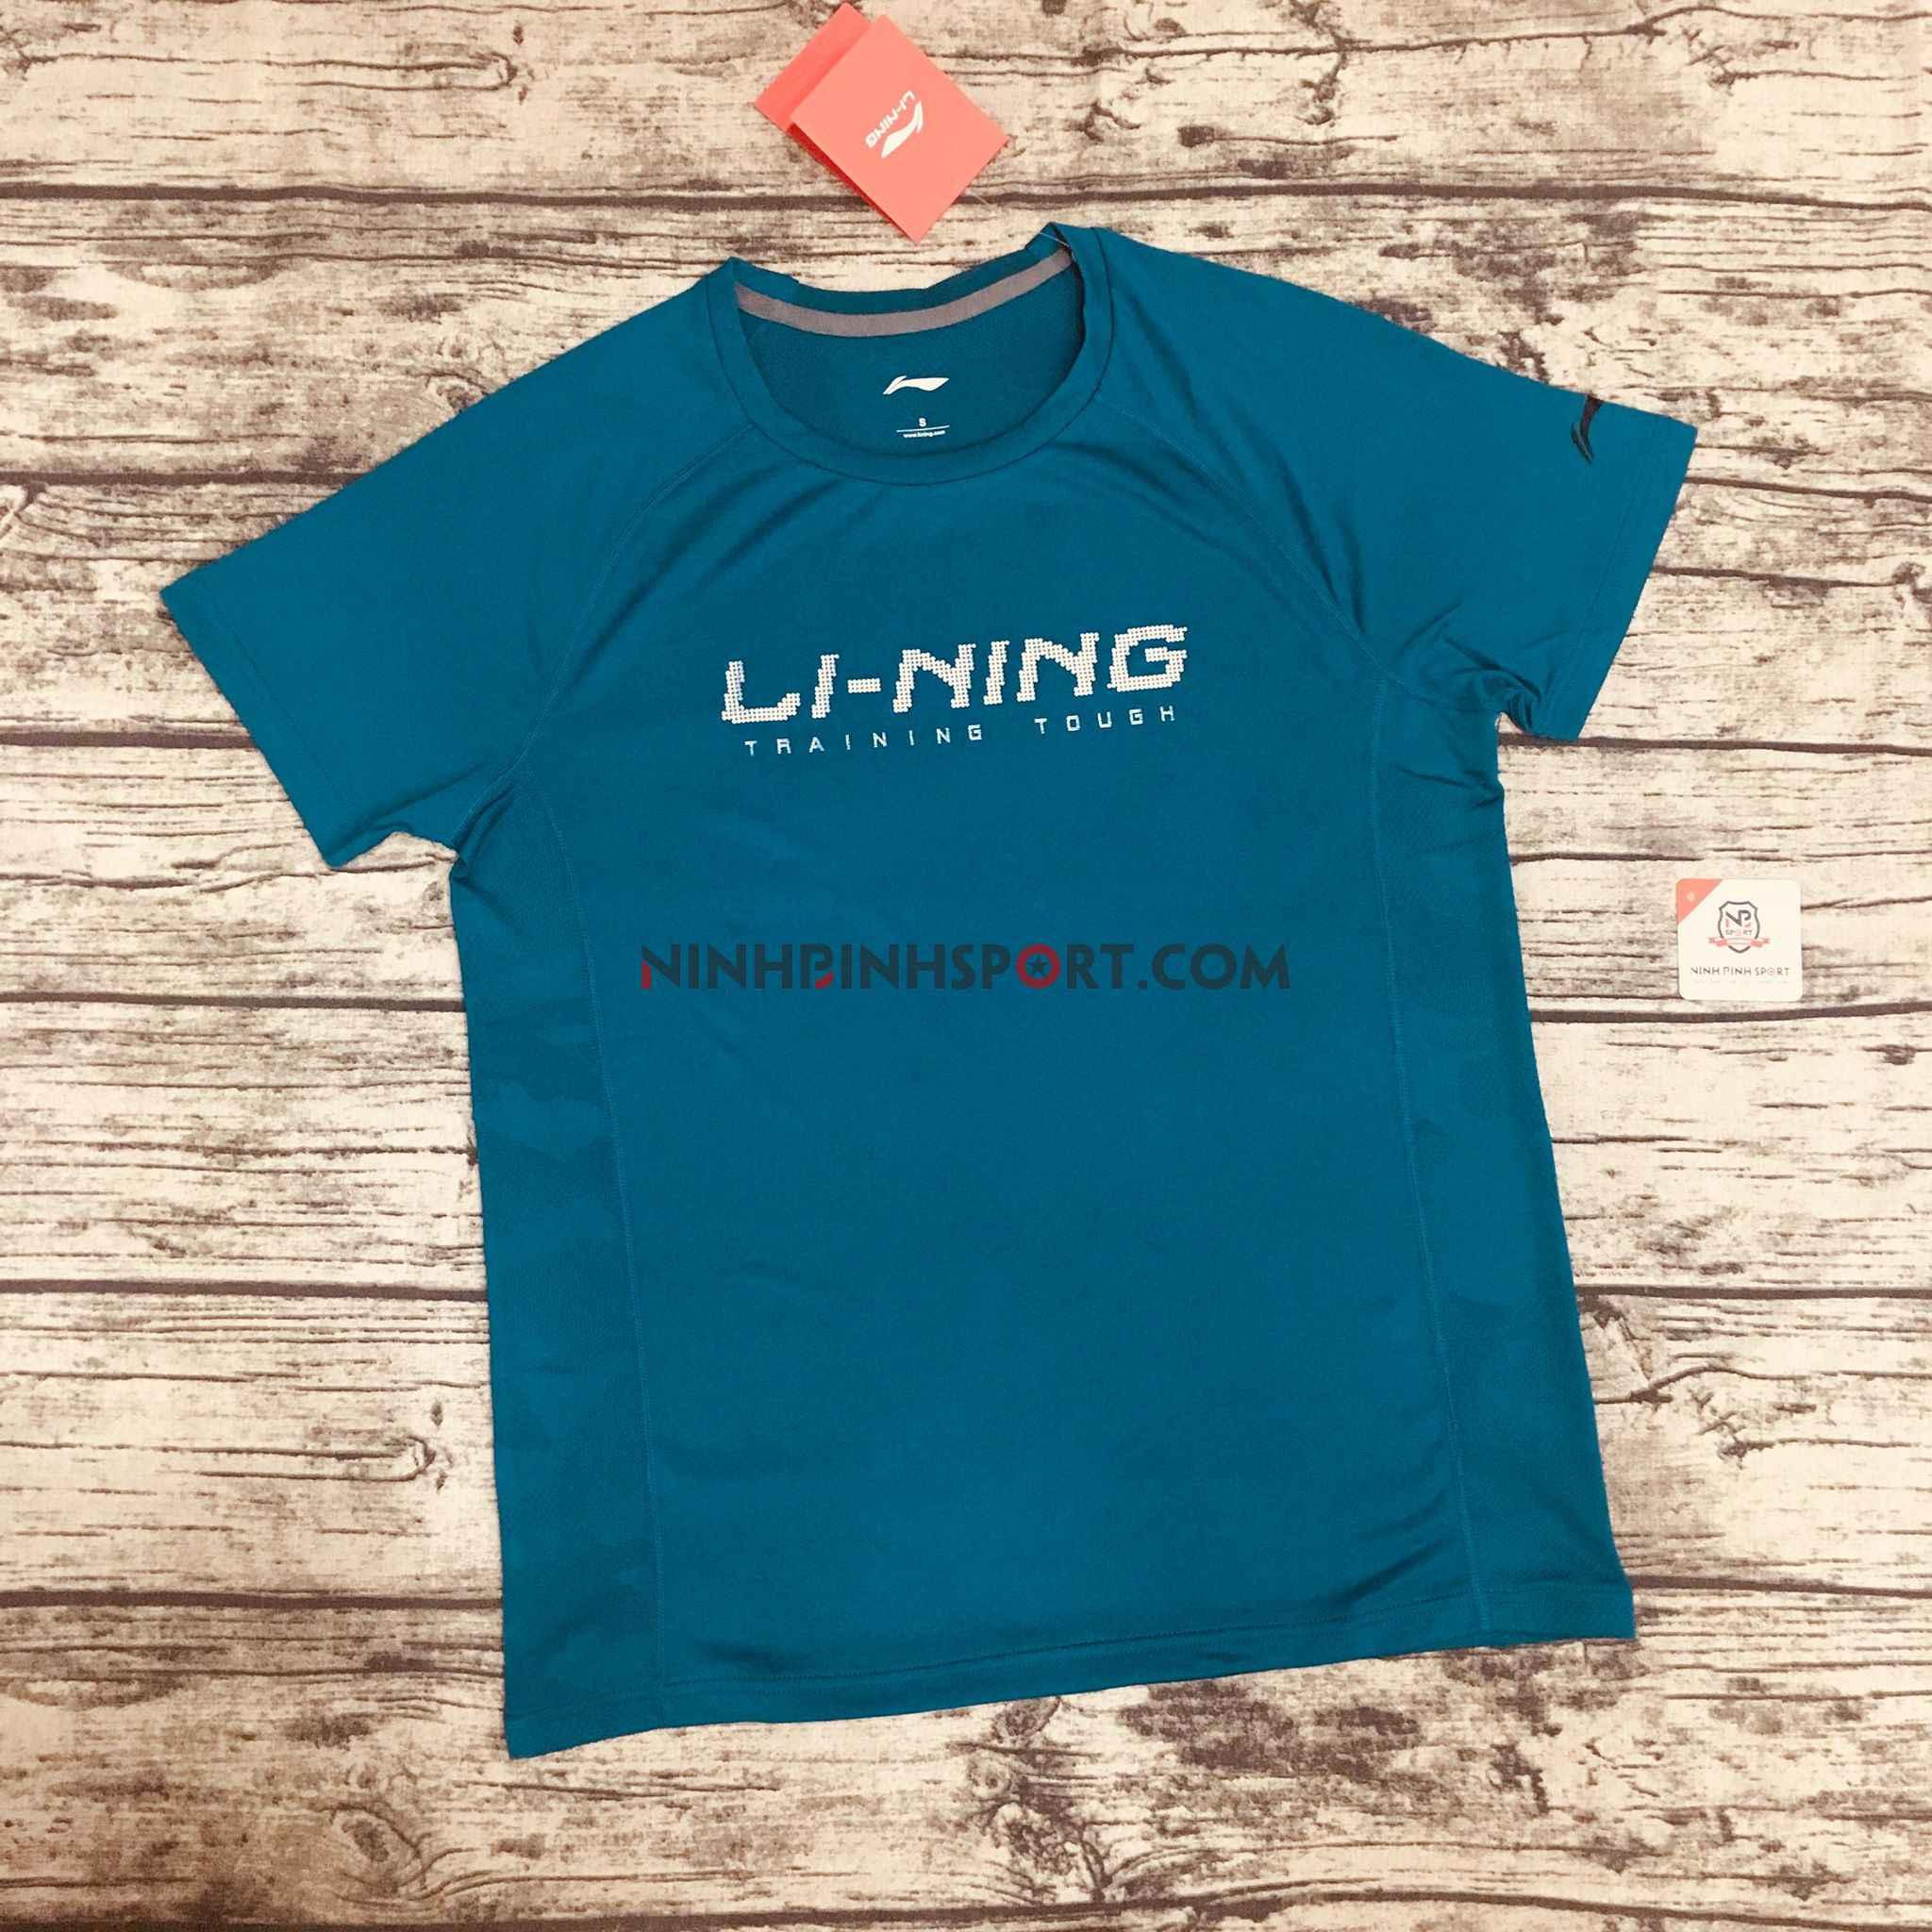 Áo thể thao nam Lining ATSN243-2